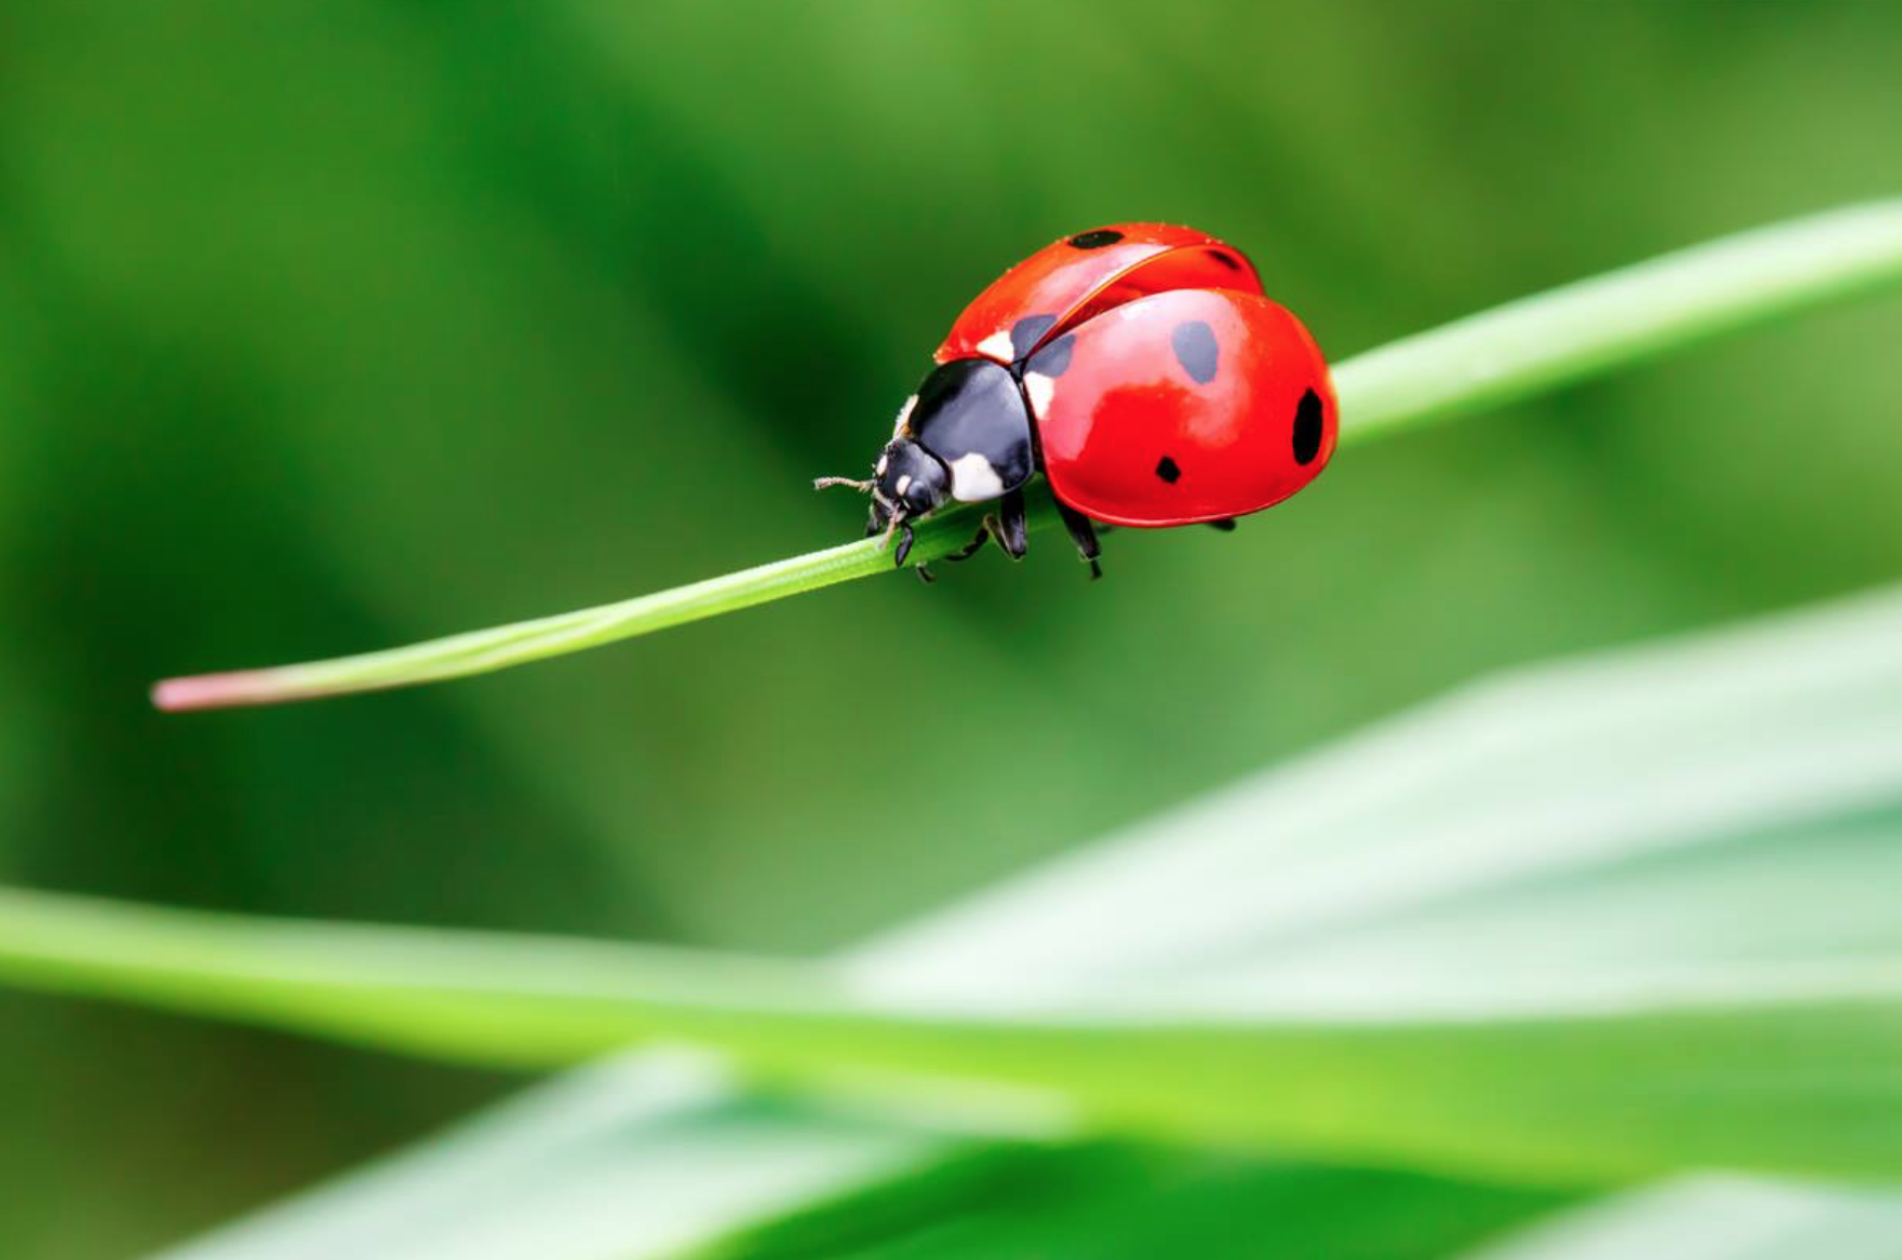 - Harmonia axyridis, the common Ladybug or Multi-Coloured Asian Lady Beetle (MALB)